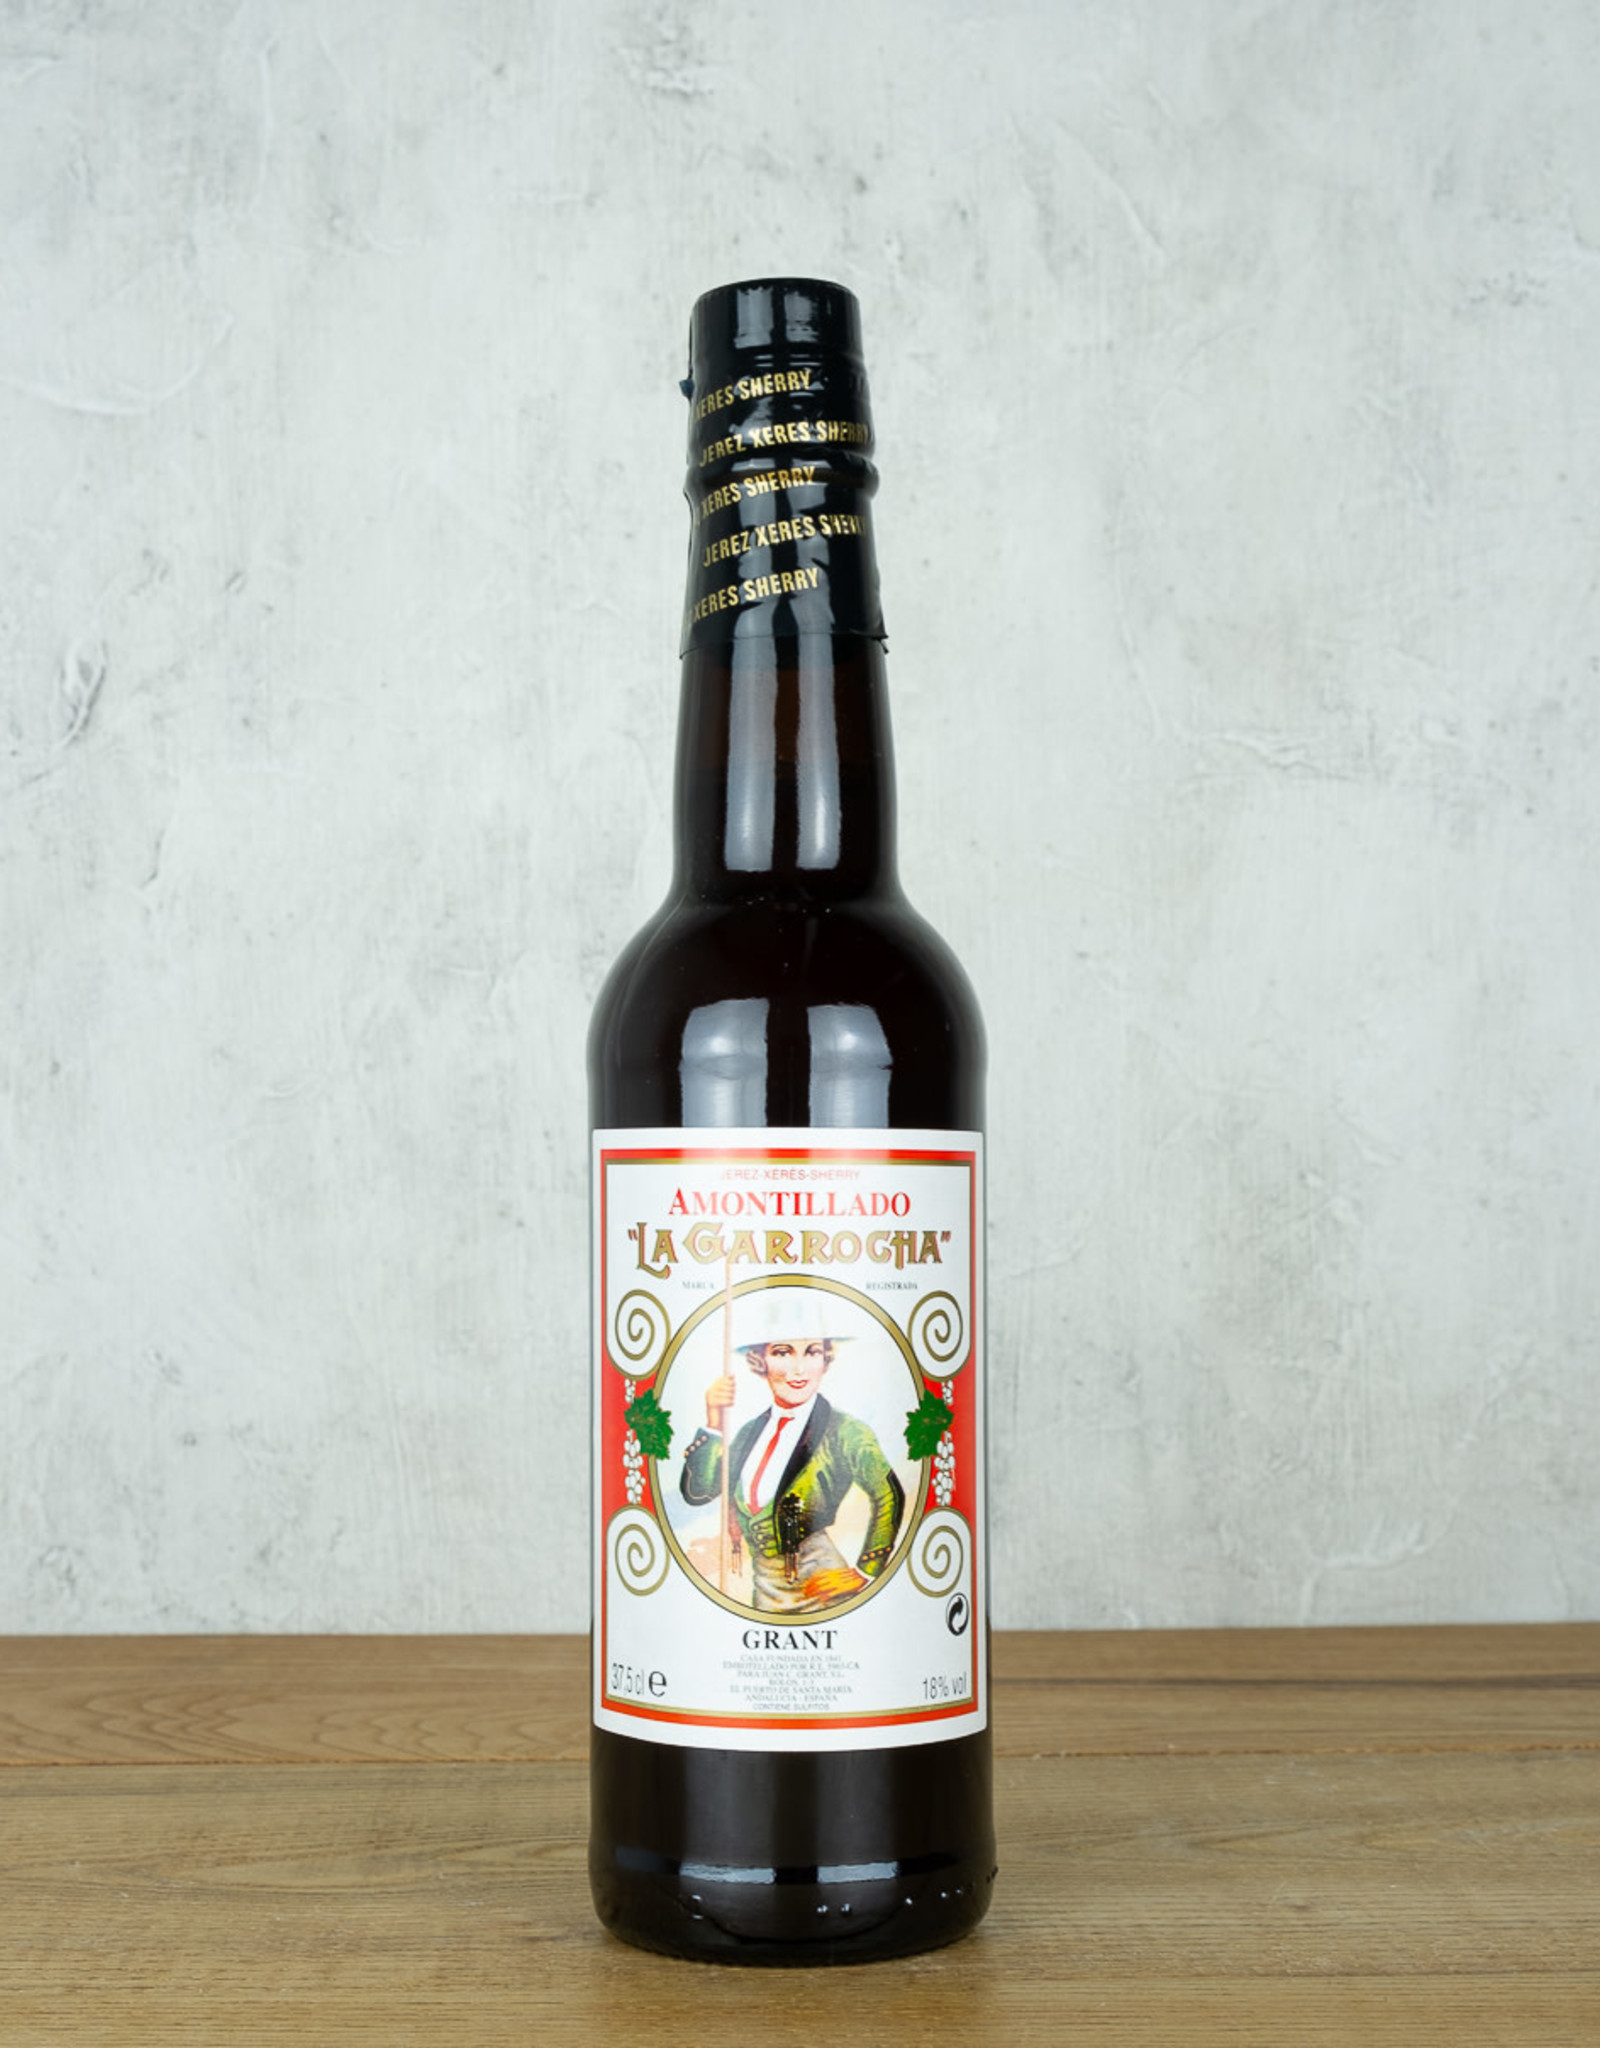 Grant La Garrocha Amontillado Sherry 375ml